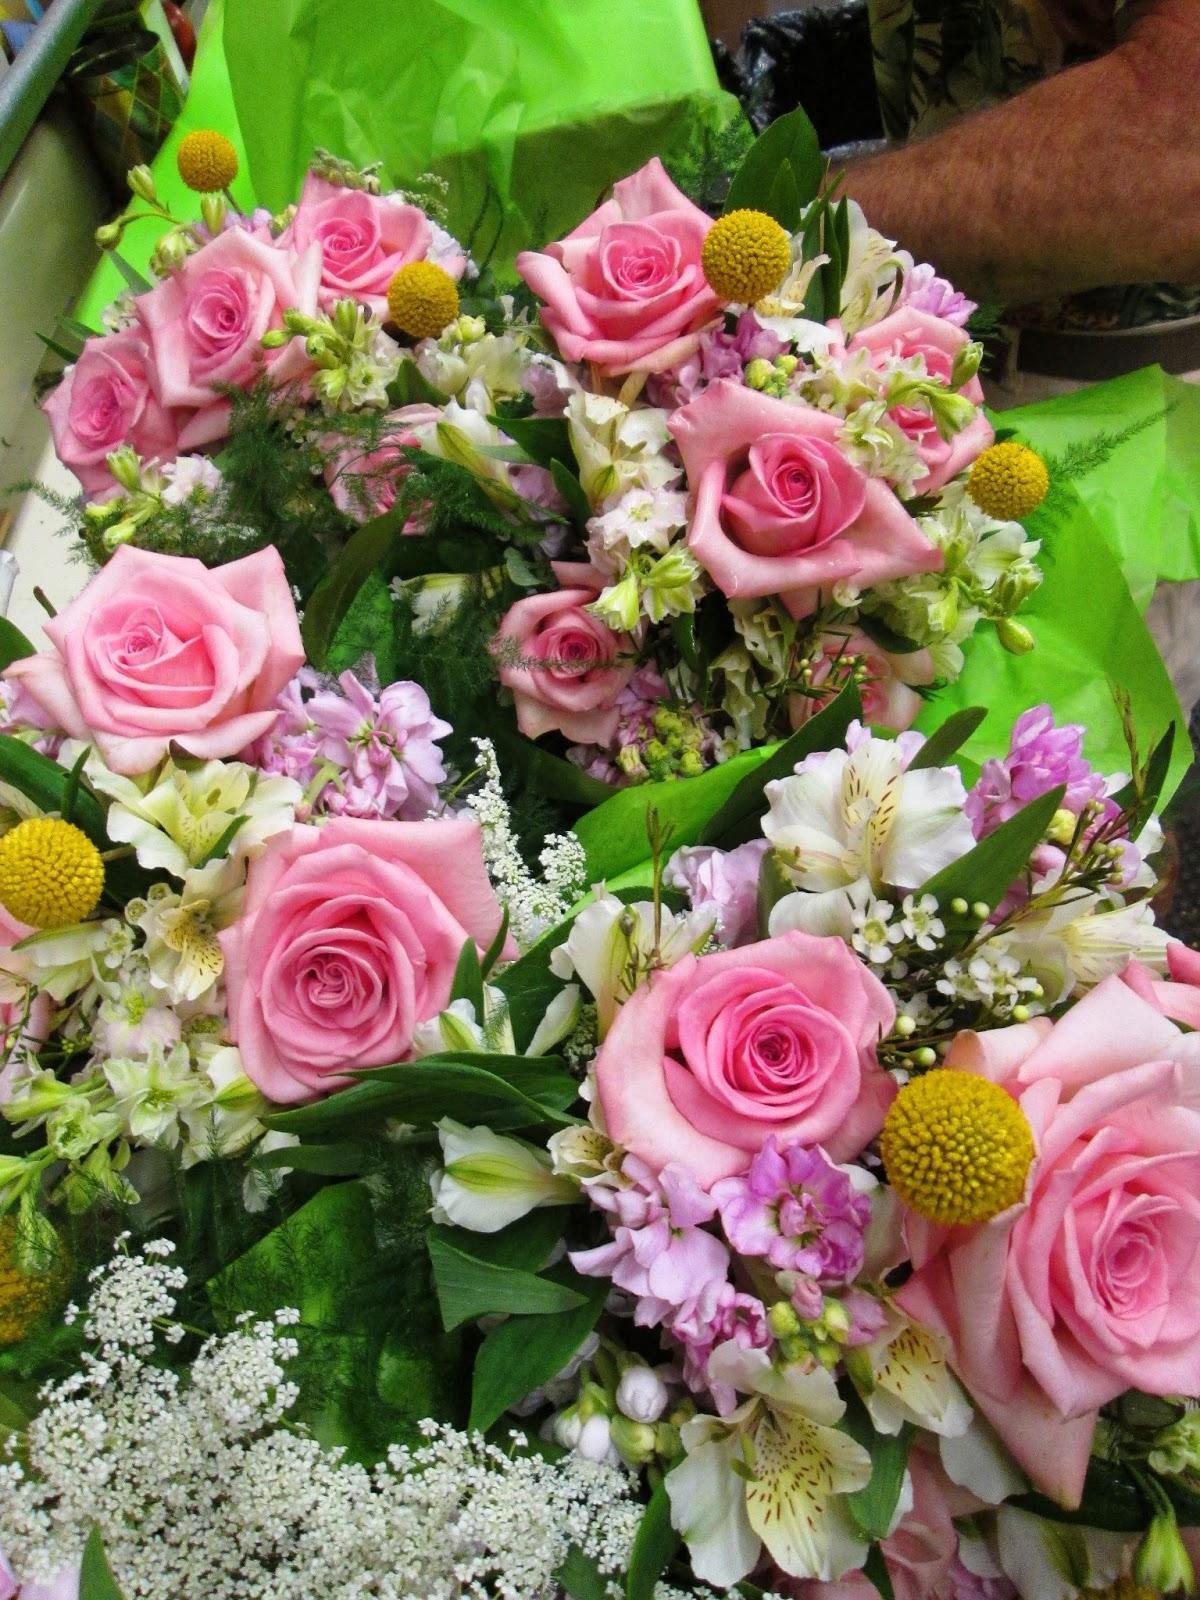 Janda Florist Www Jandaflorist Com 10 Cranbrook Road Cockeysville Md 410 666 8888